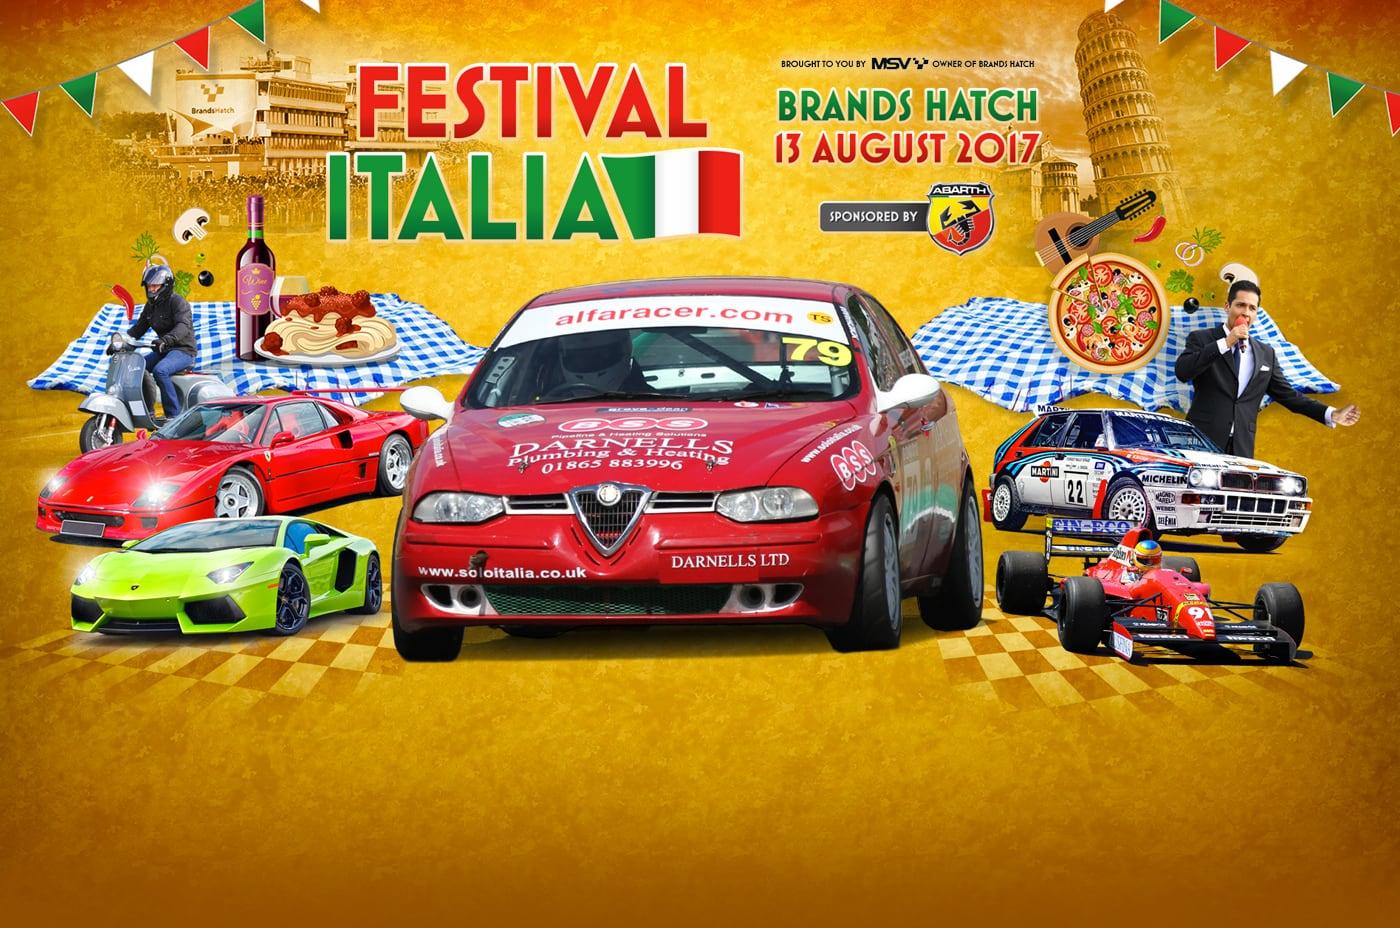 Festival Italia 2017